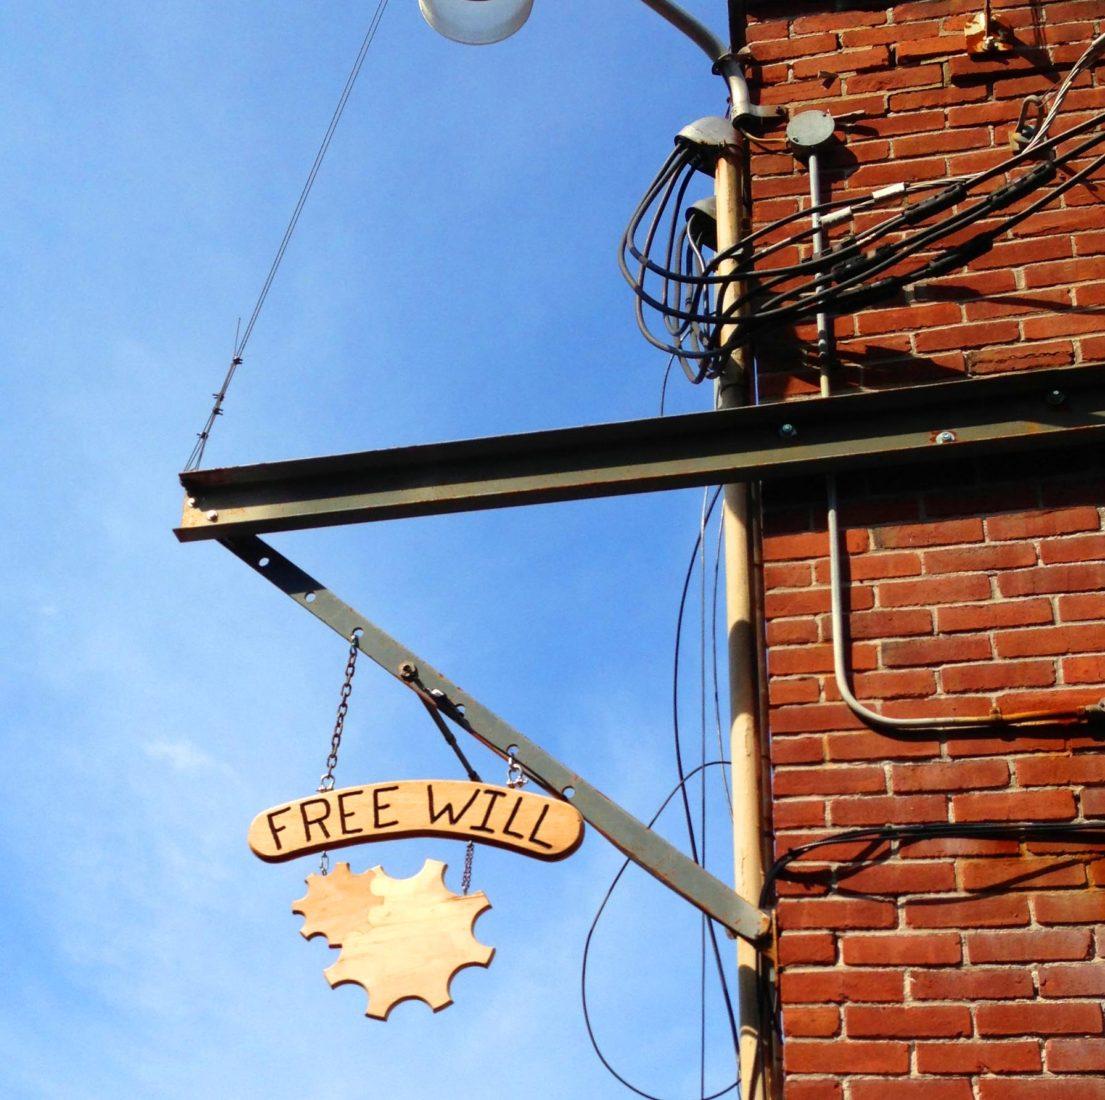 157. Freewill Brewing, Perkasie PA 2013